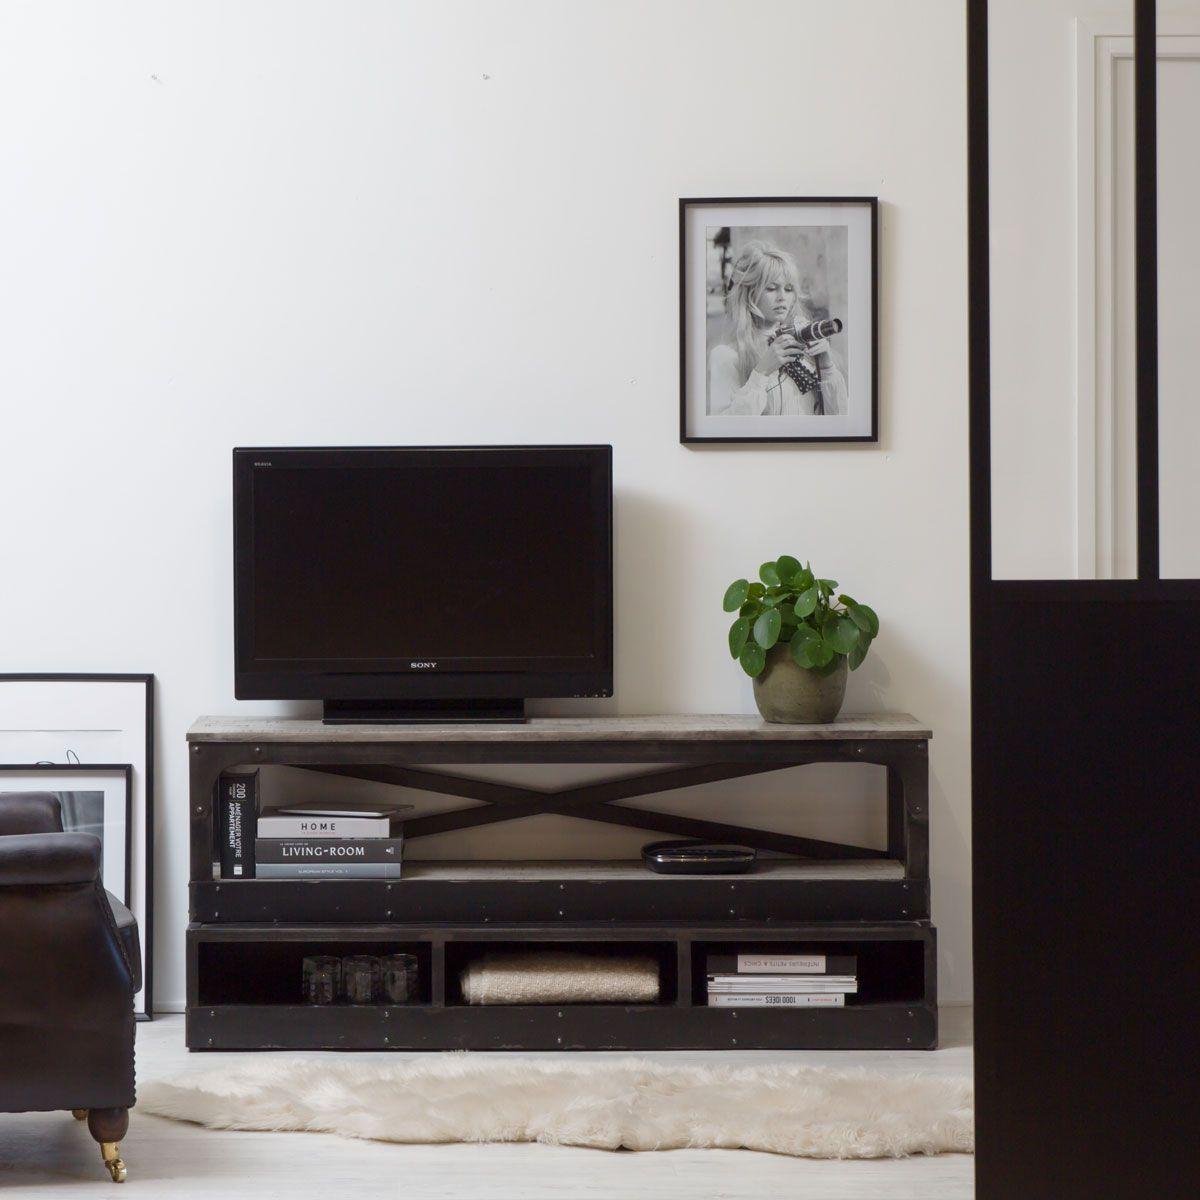 Meuble Tv Ouvert Escalier Manguier Et Metal En 2020 Meuble Tv Mobilier De Salon Meuble En Pin Massif